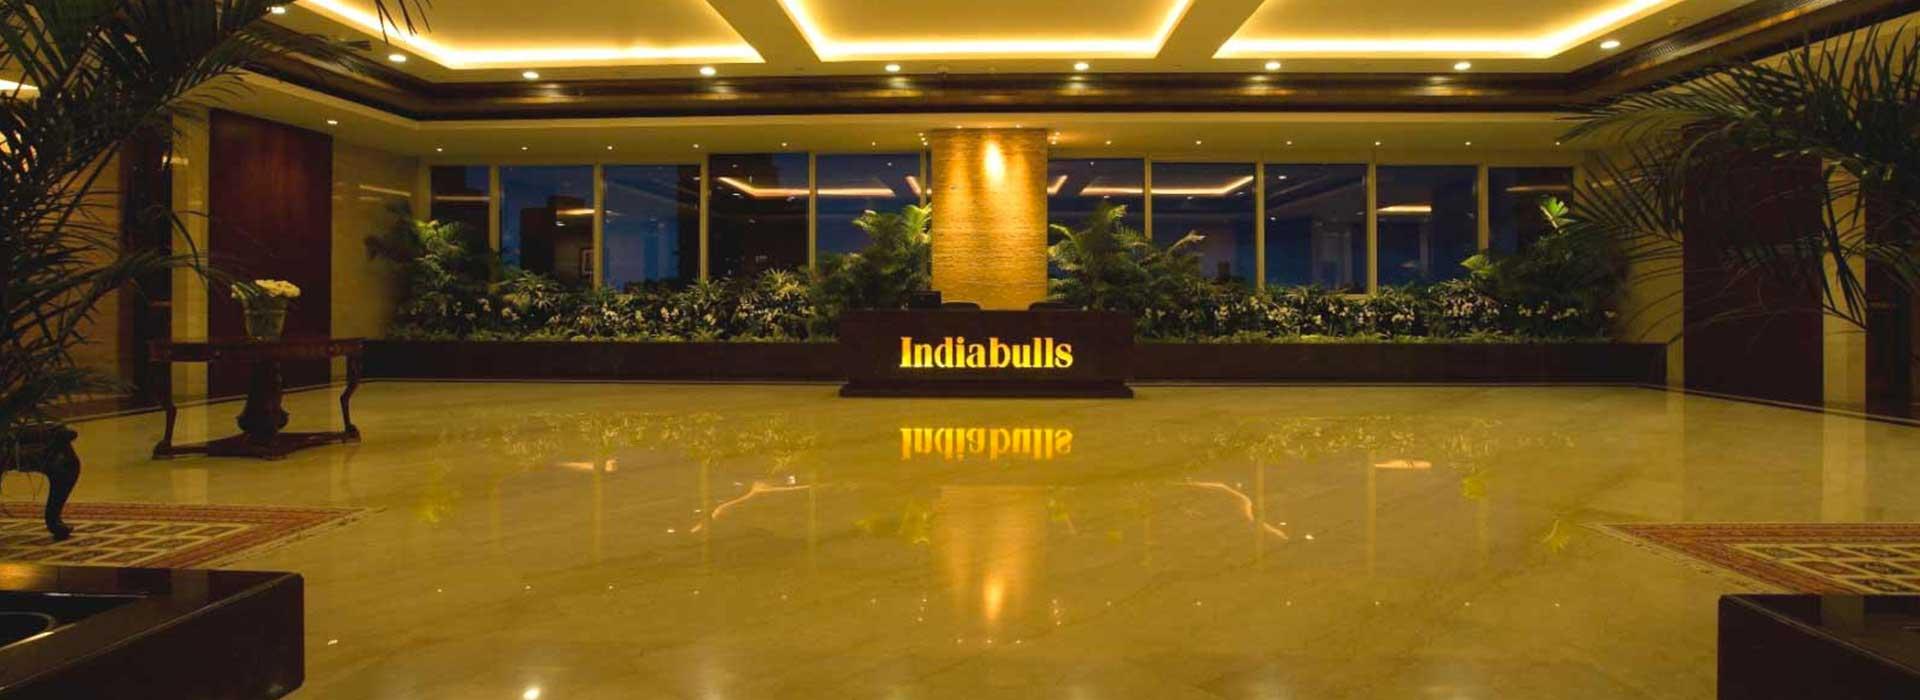 Indiabulls Finance Centre - Lower Parel